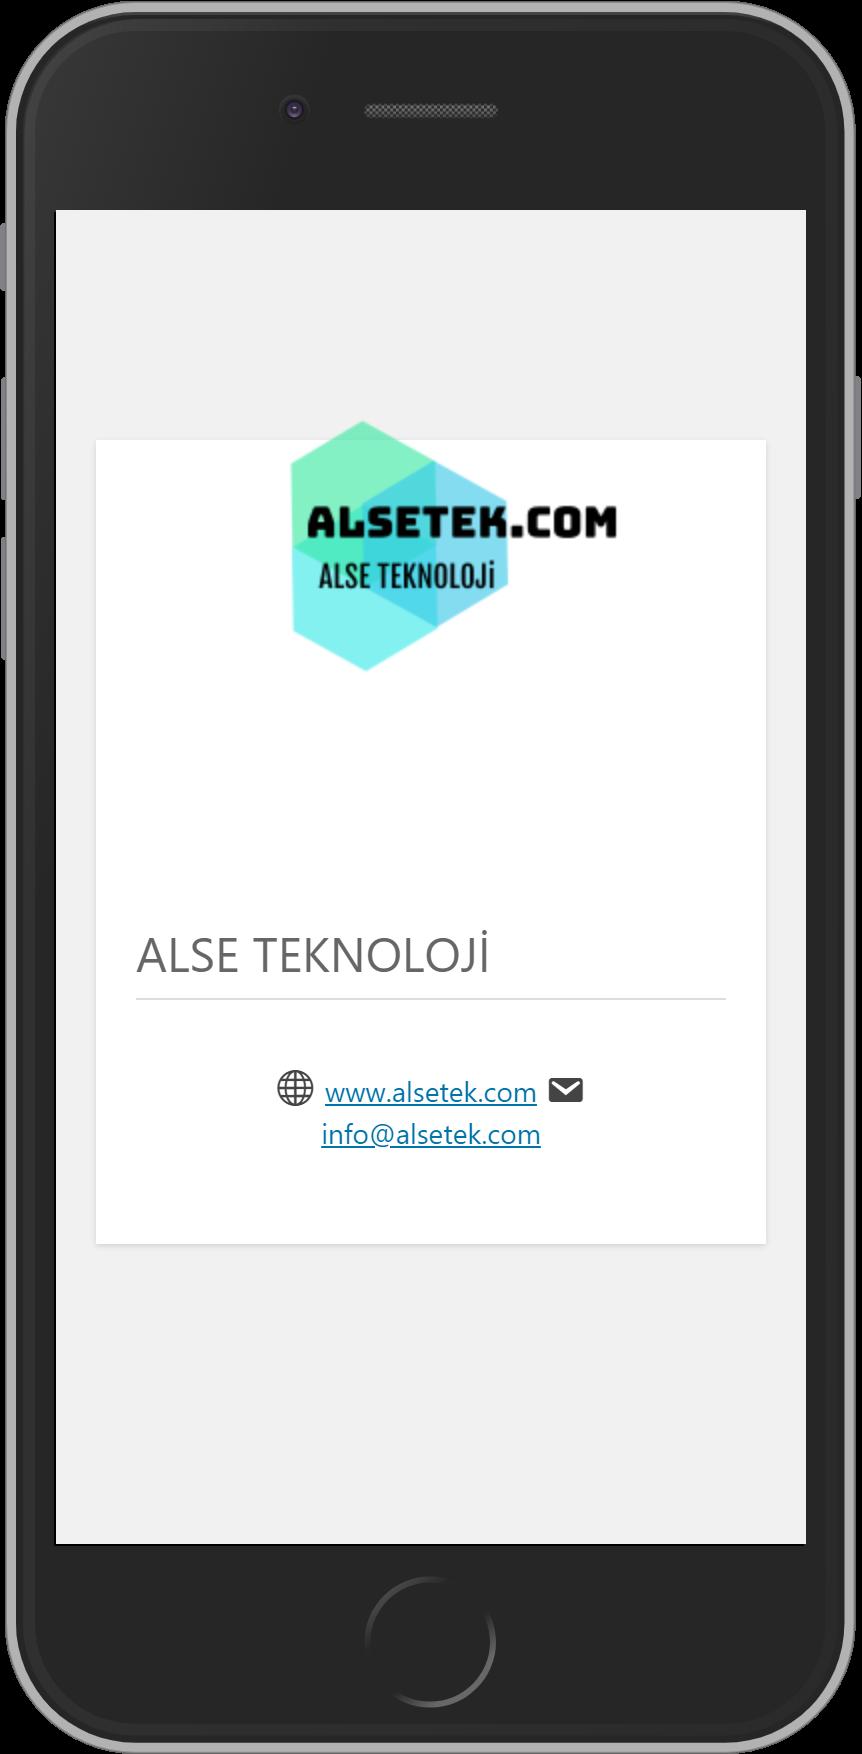 alsetek.com